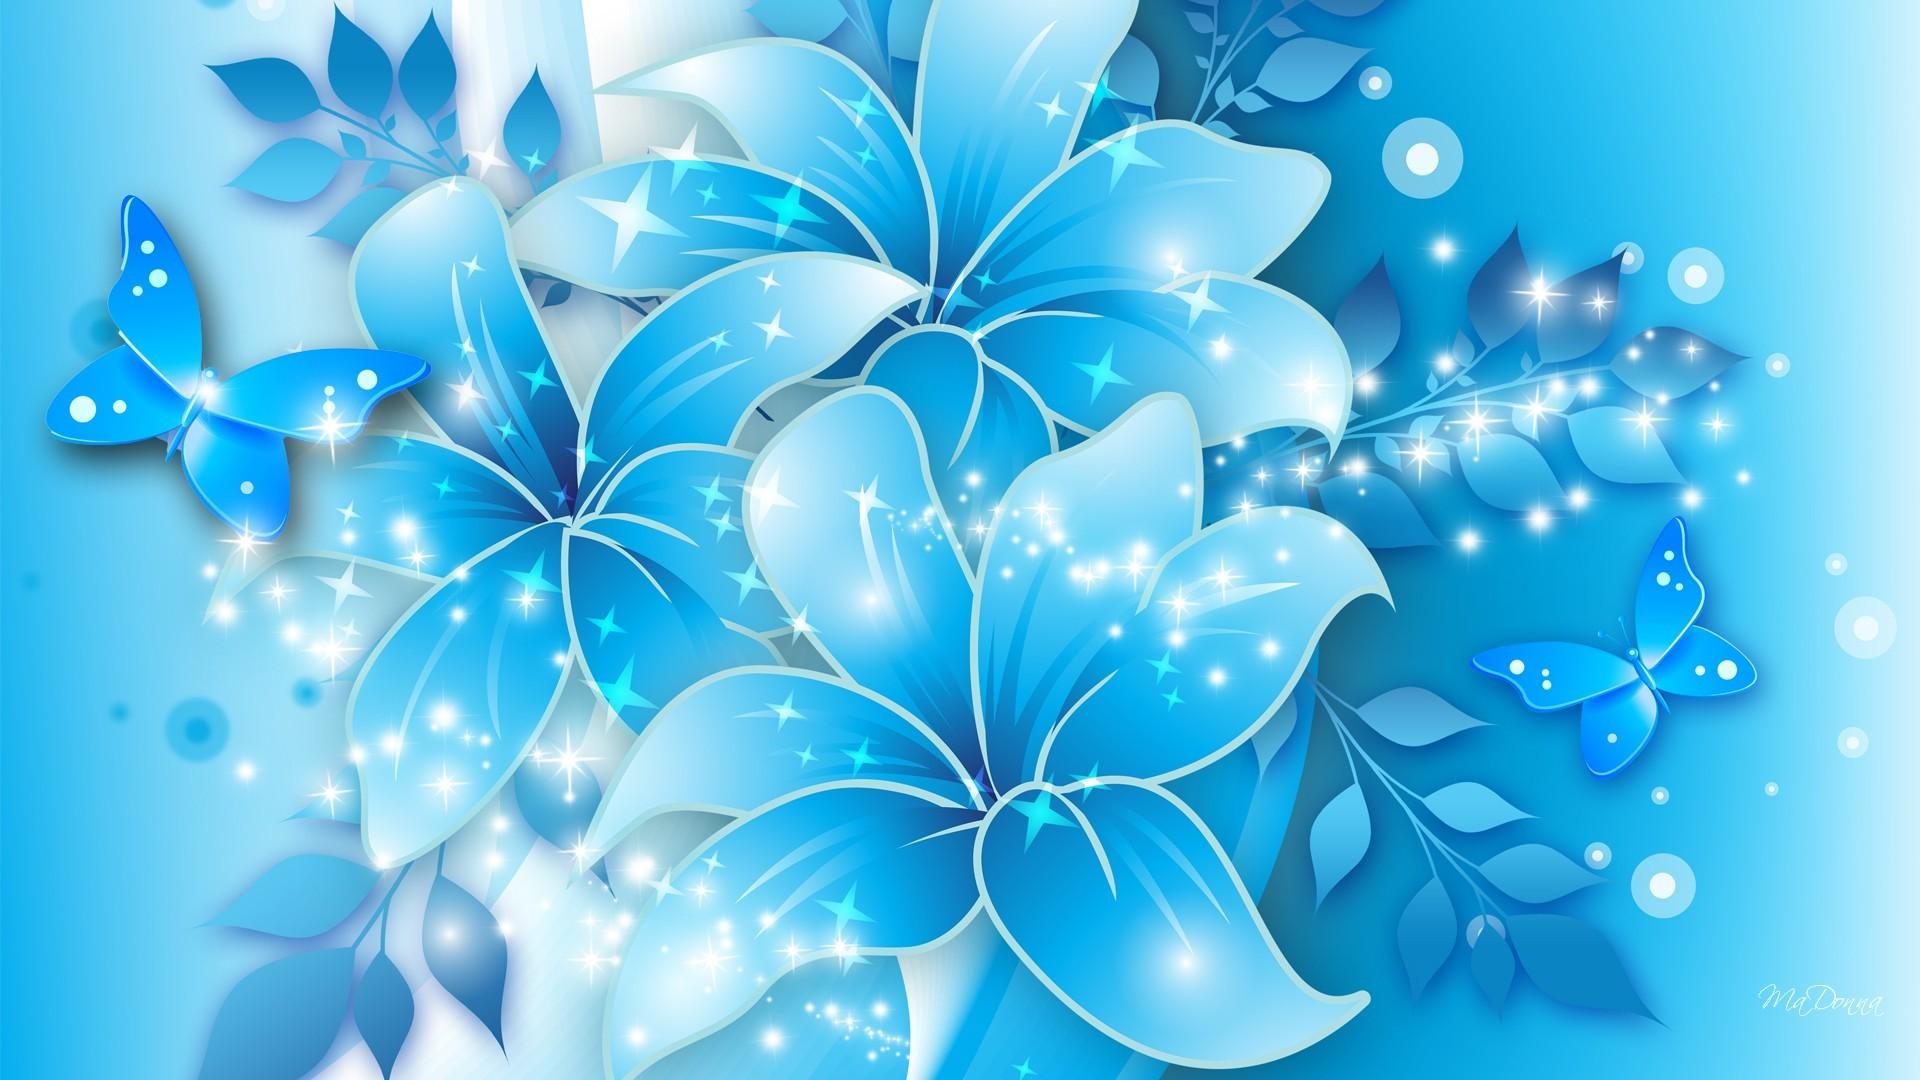 Blue wallpaper background 69 images 2560x1600 navy blue hd wallpapers navy blue hd wallpaper navy blue backgrounds 7628 voltagebd Gallery